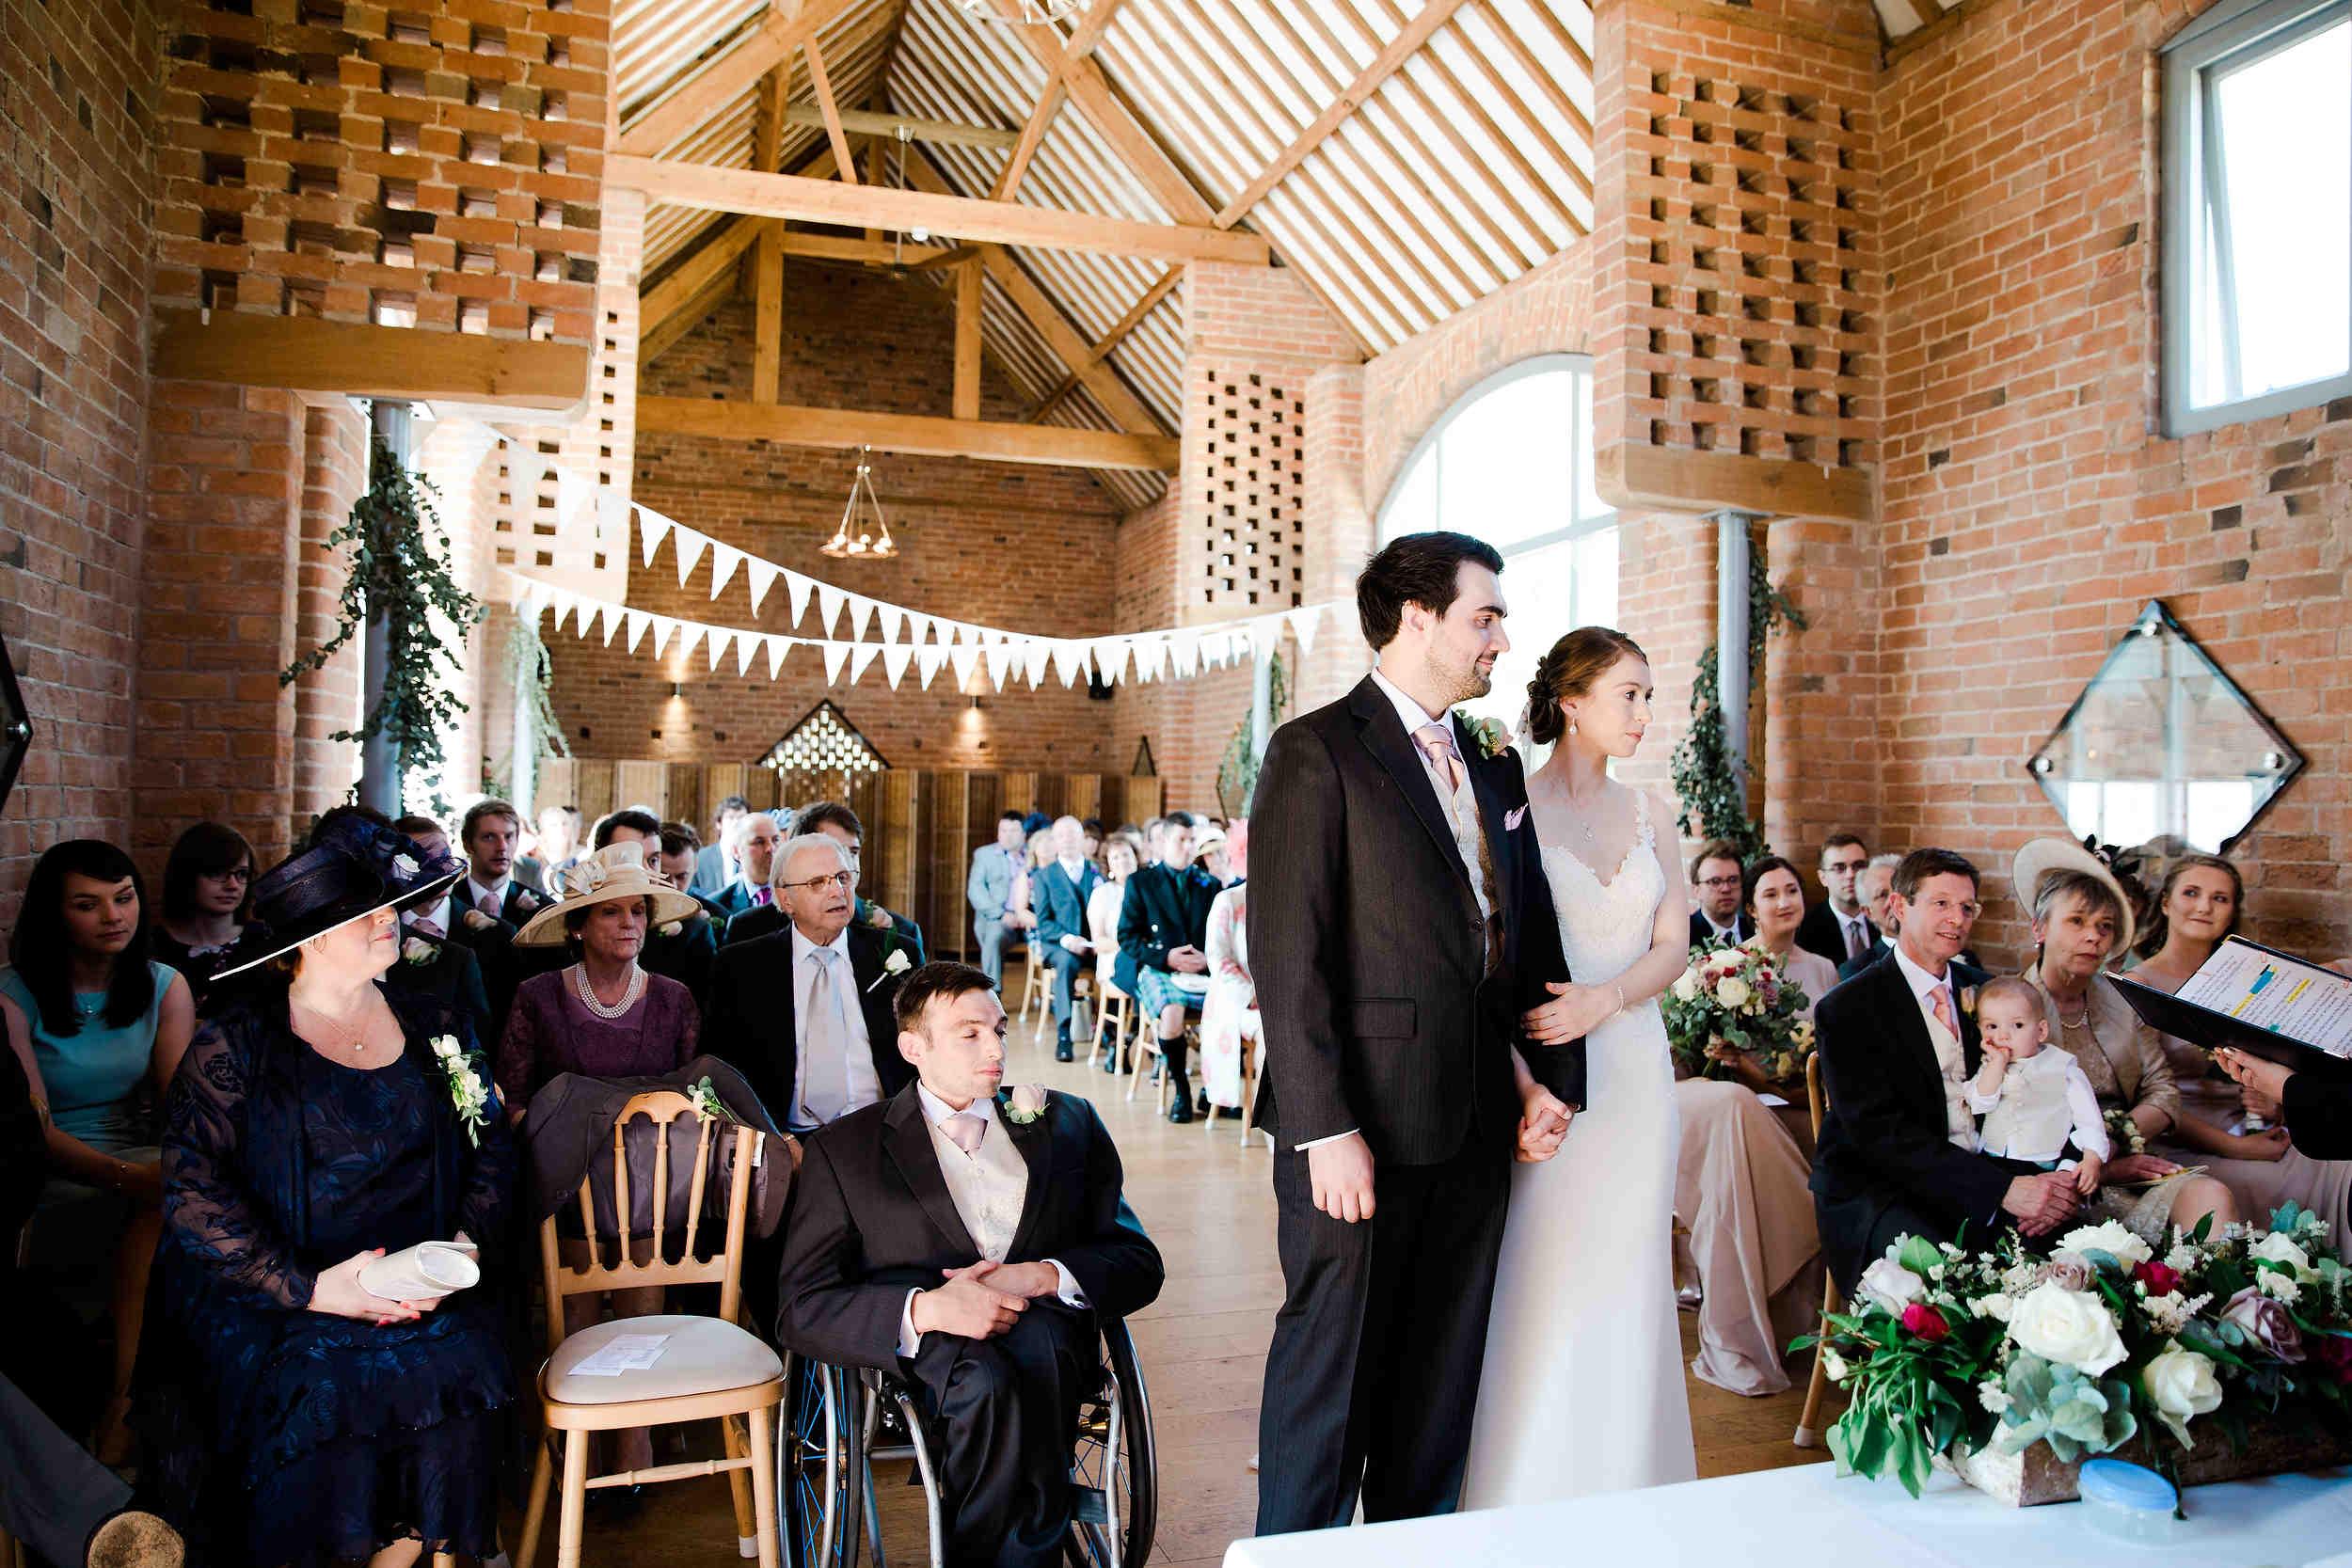 wedding ceremony swallows nest barn